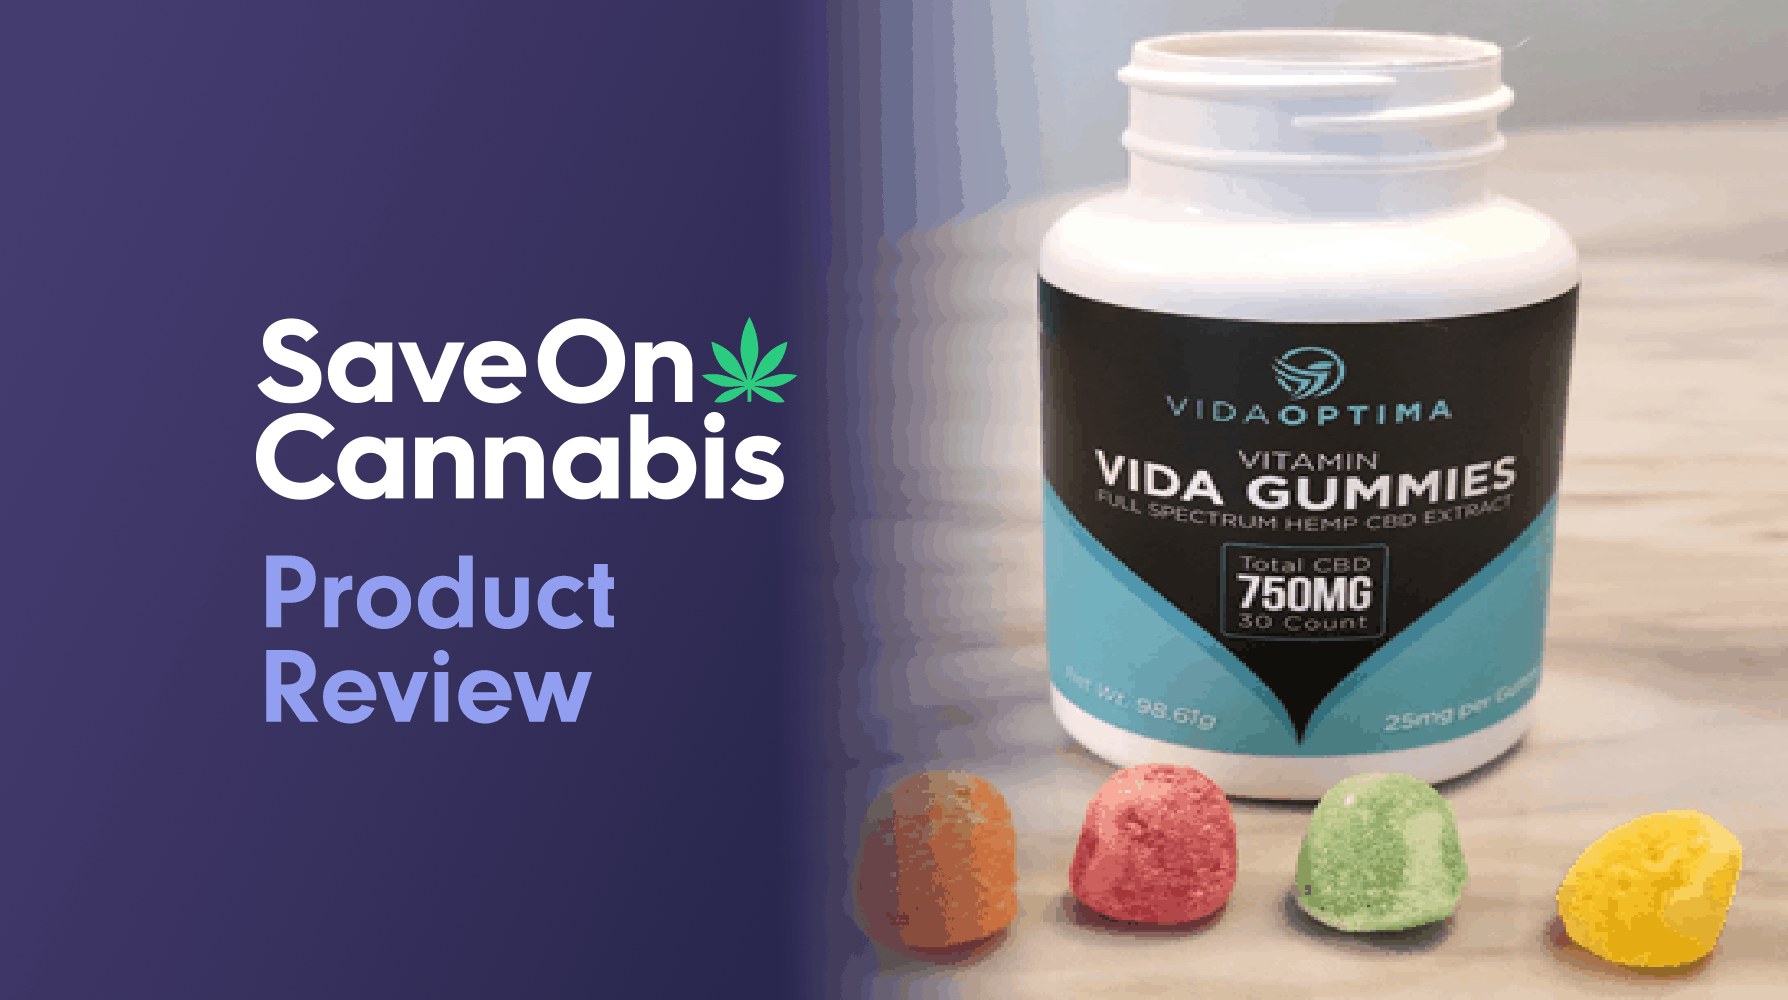 Vida Optima Vitamin Gummies Save On Cannabis Review Website